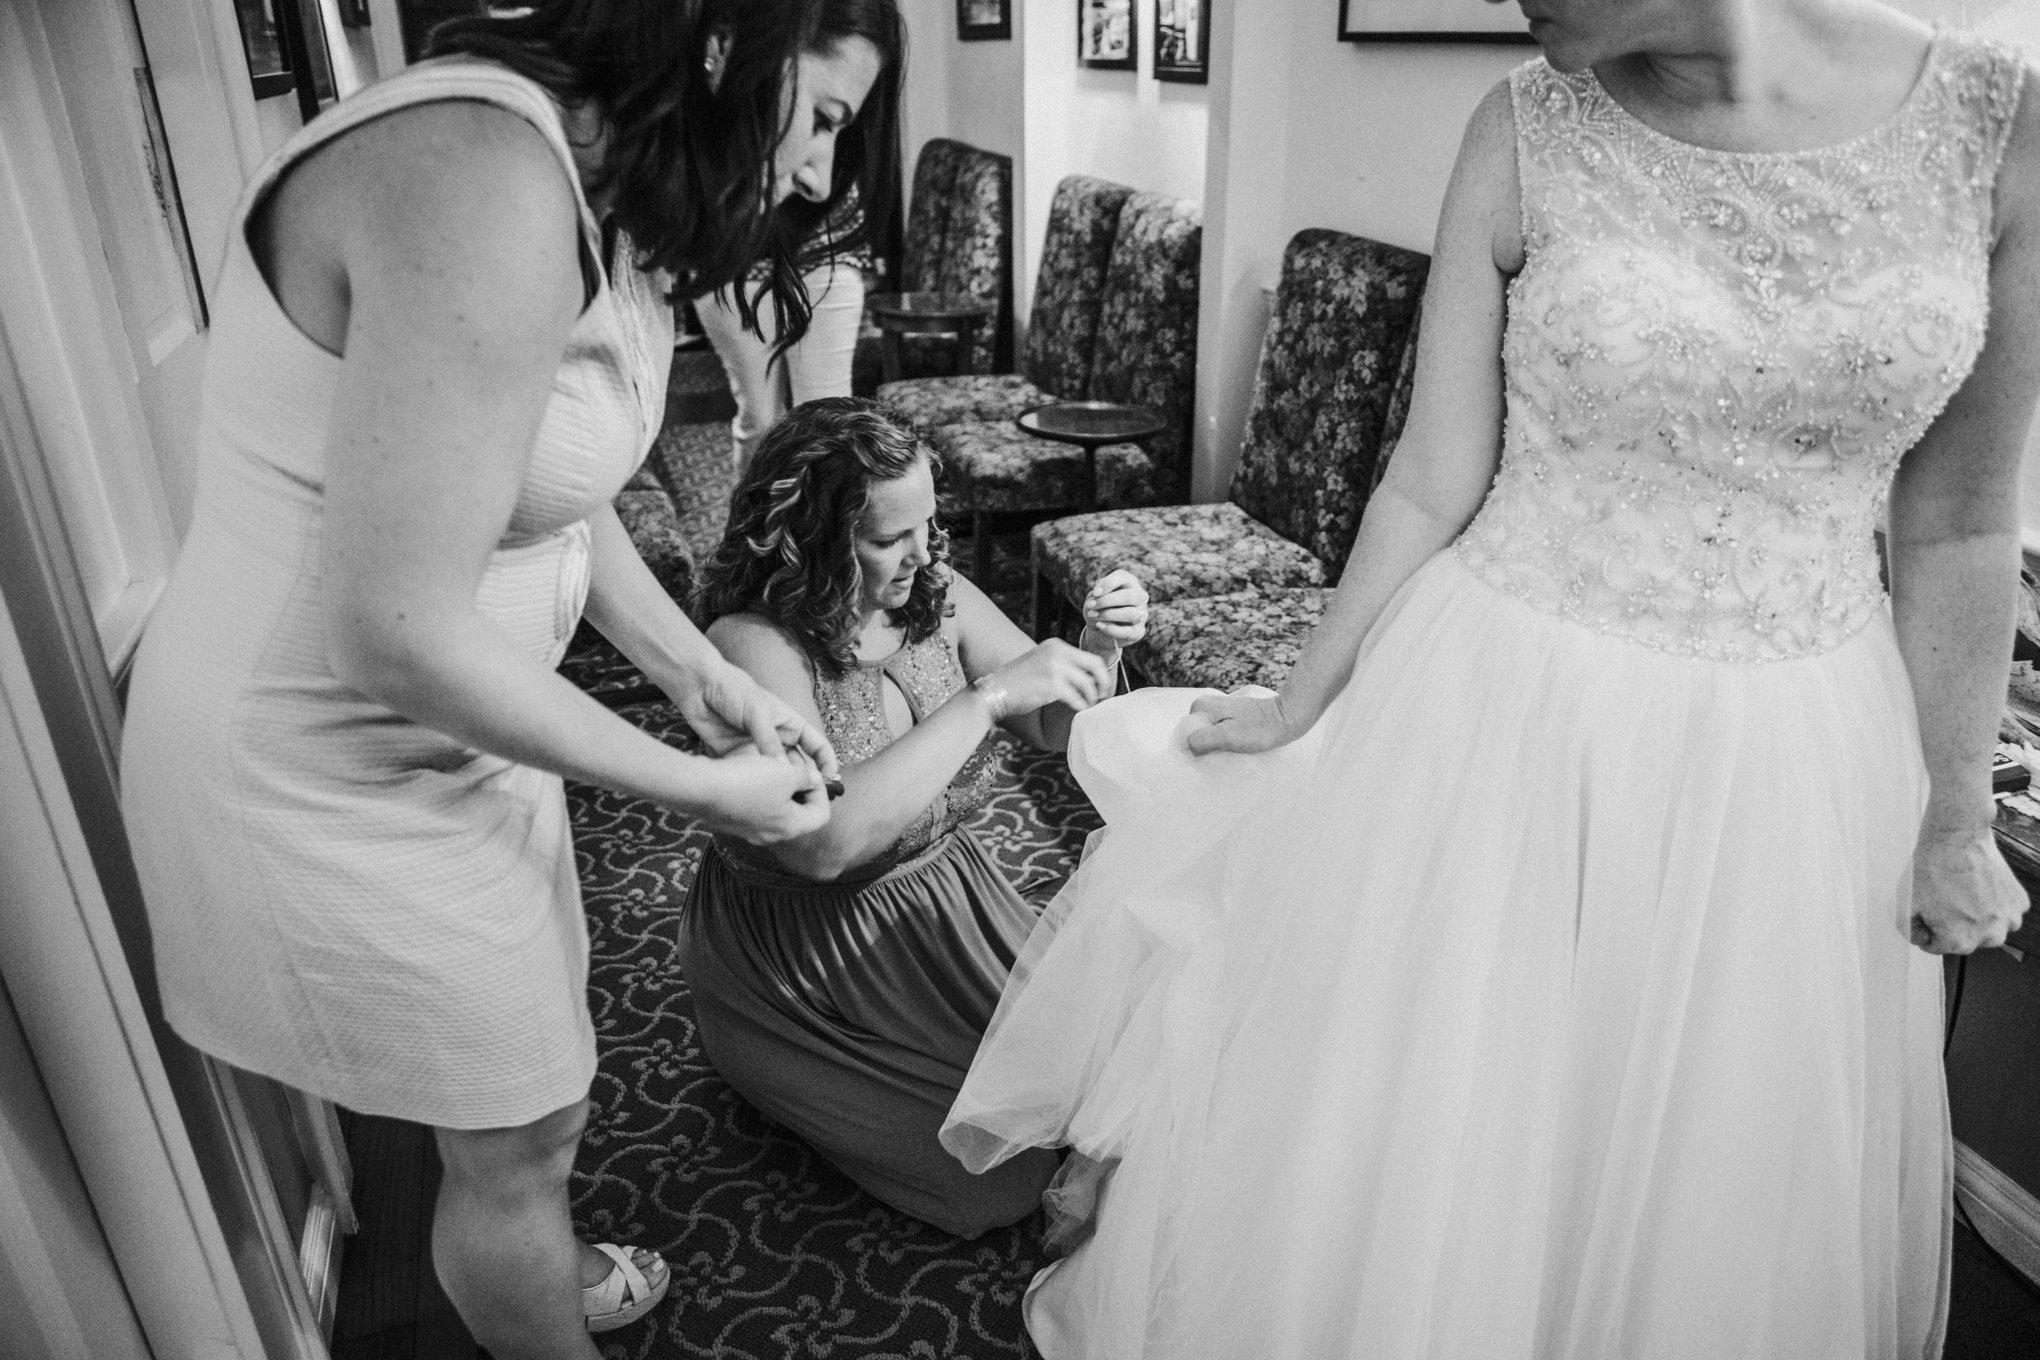 Lena_Mirisola_2017_Weddings_-018.jpg